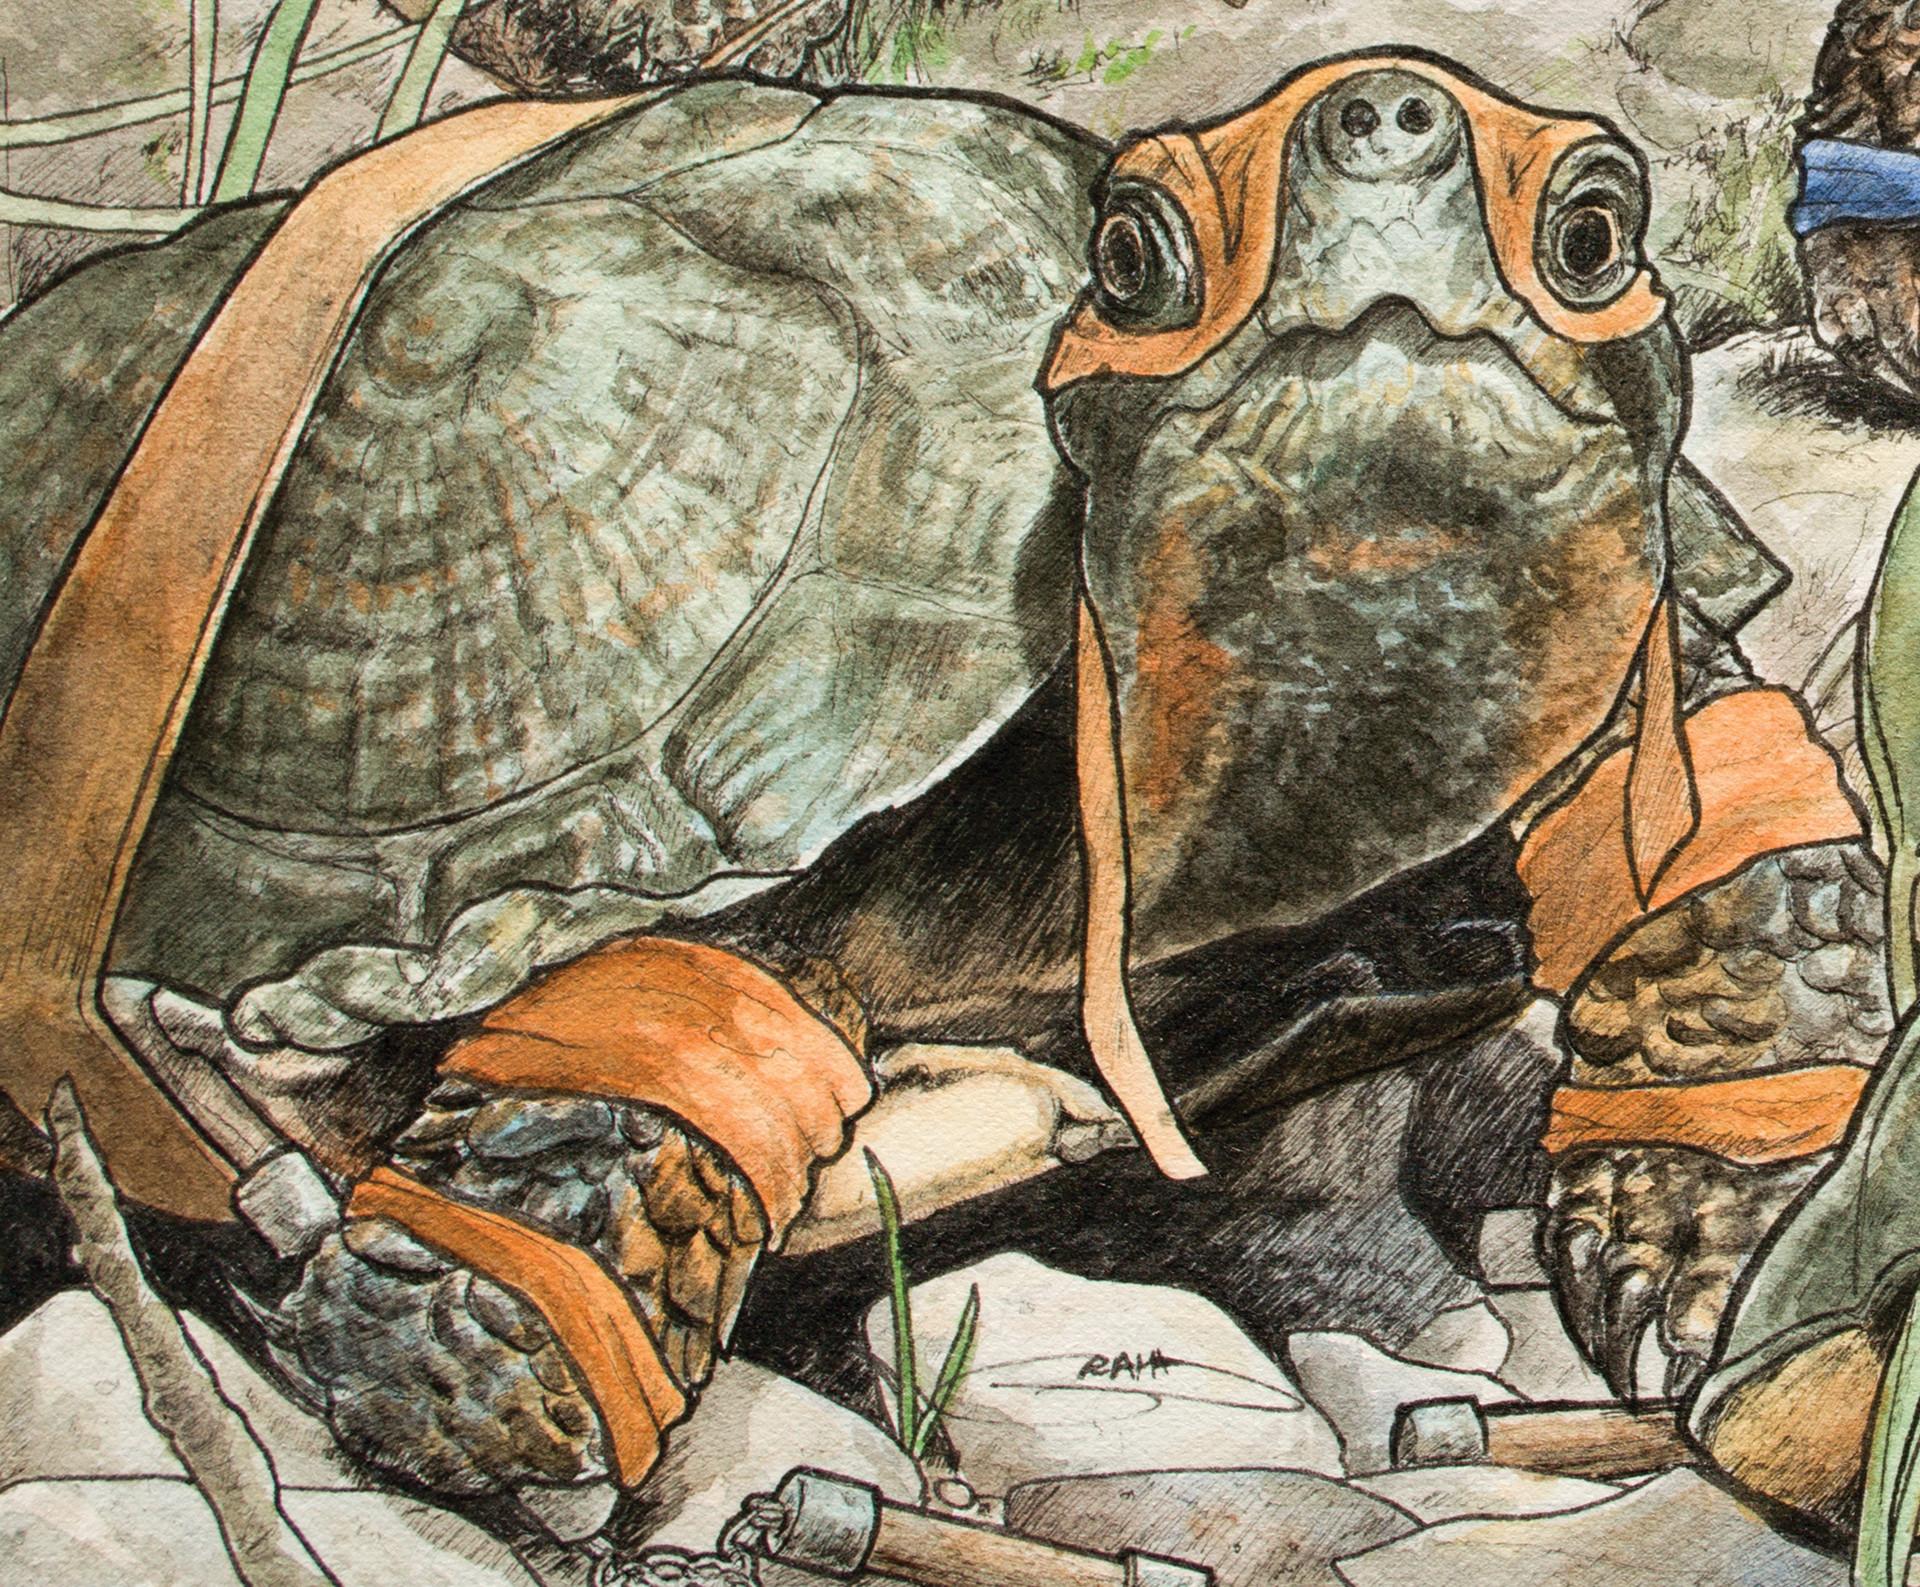 Graham moogk soulis moogk soulis turtles mic